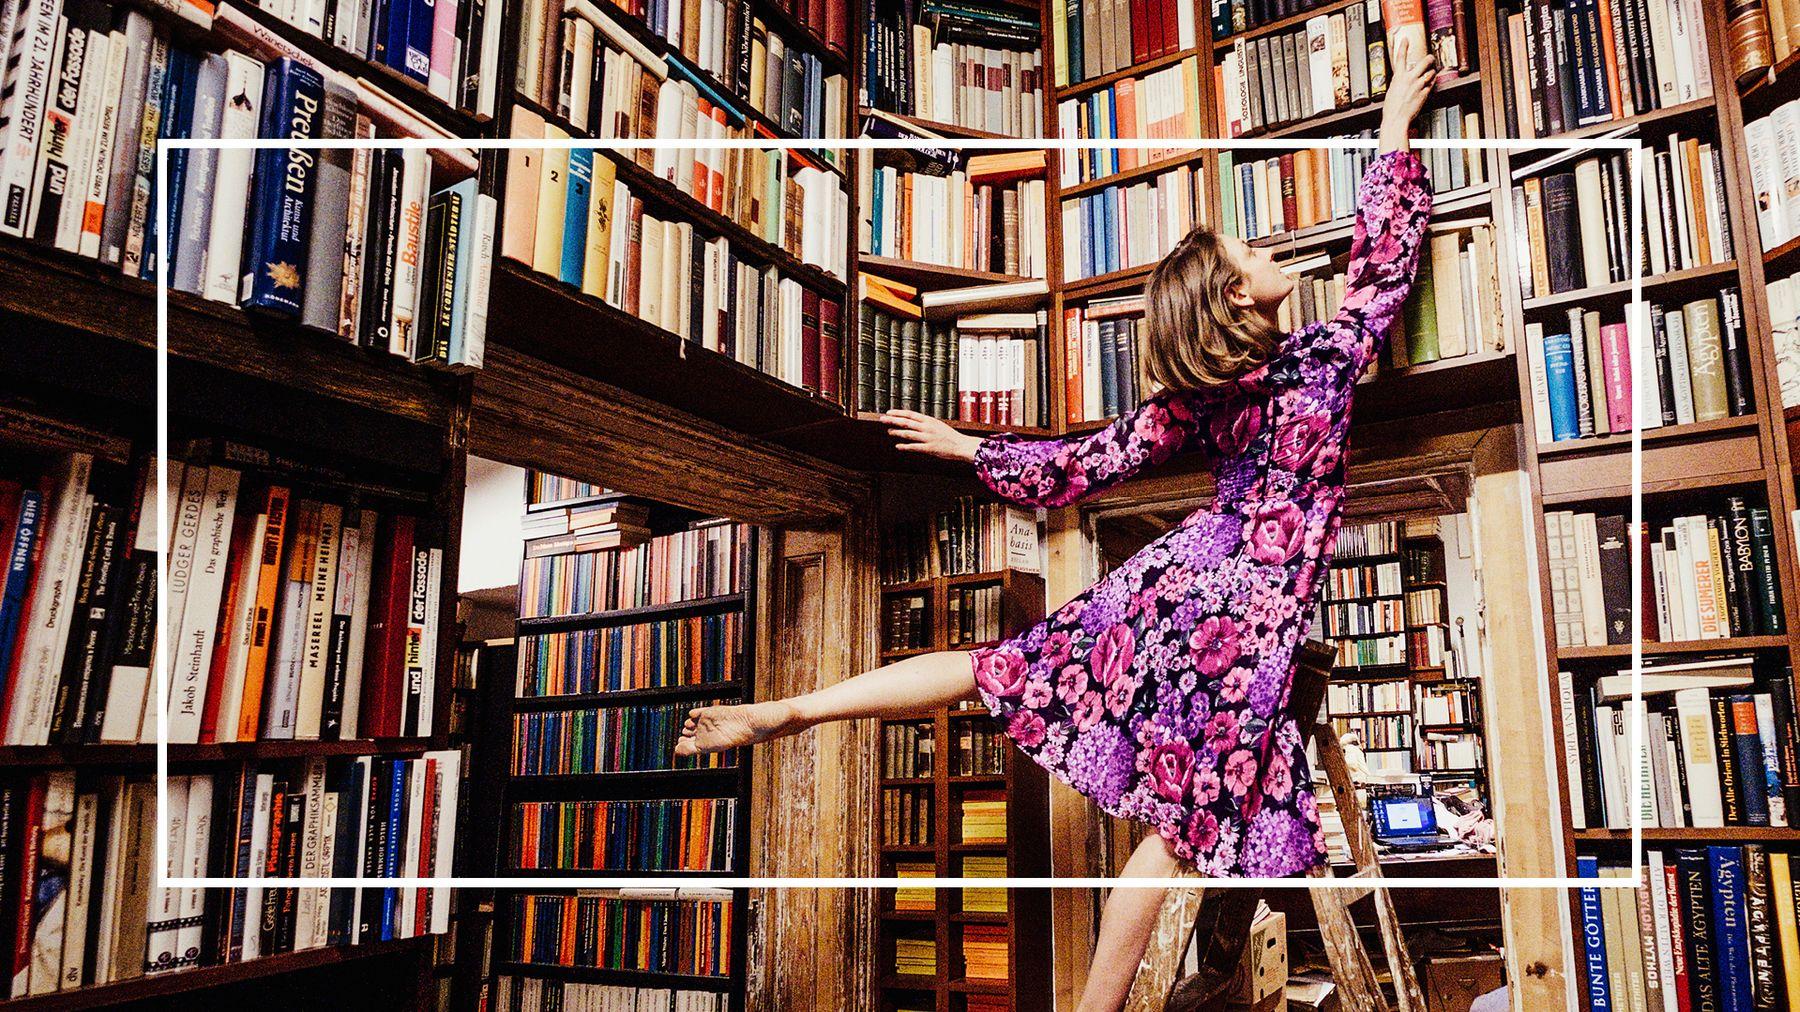 Photo of woman browsing bookshelves